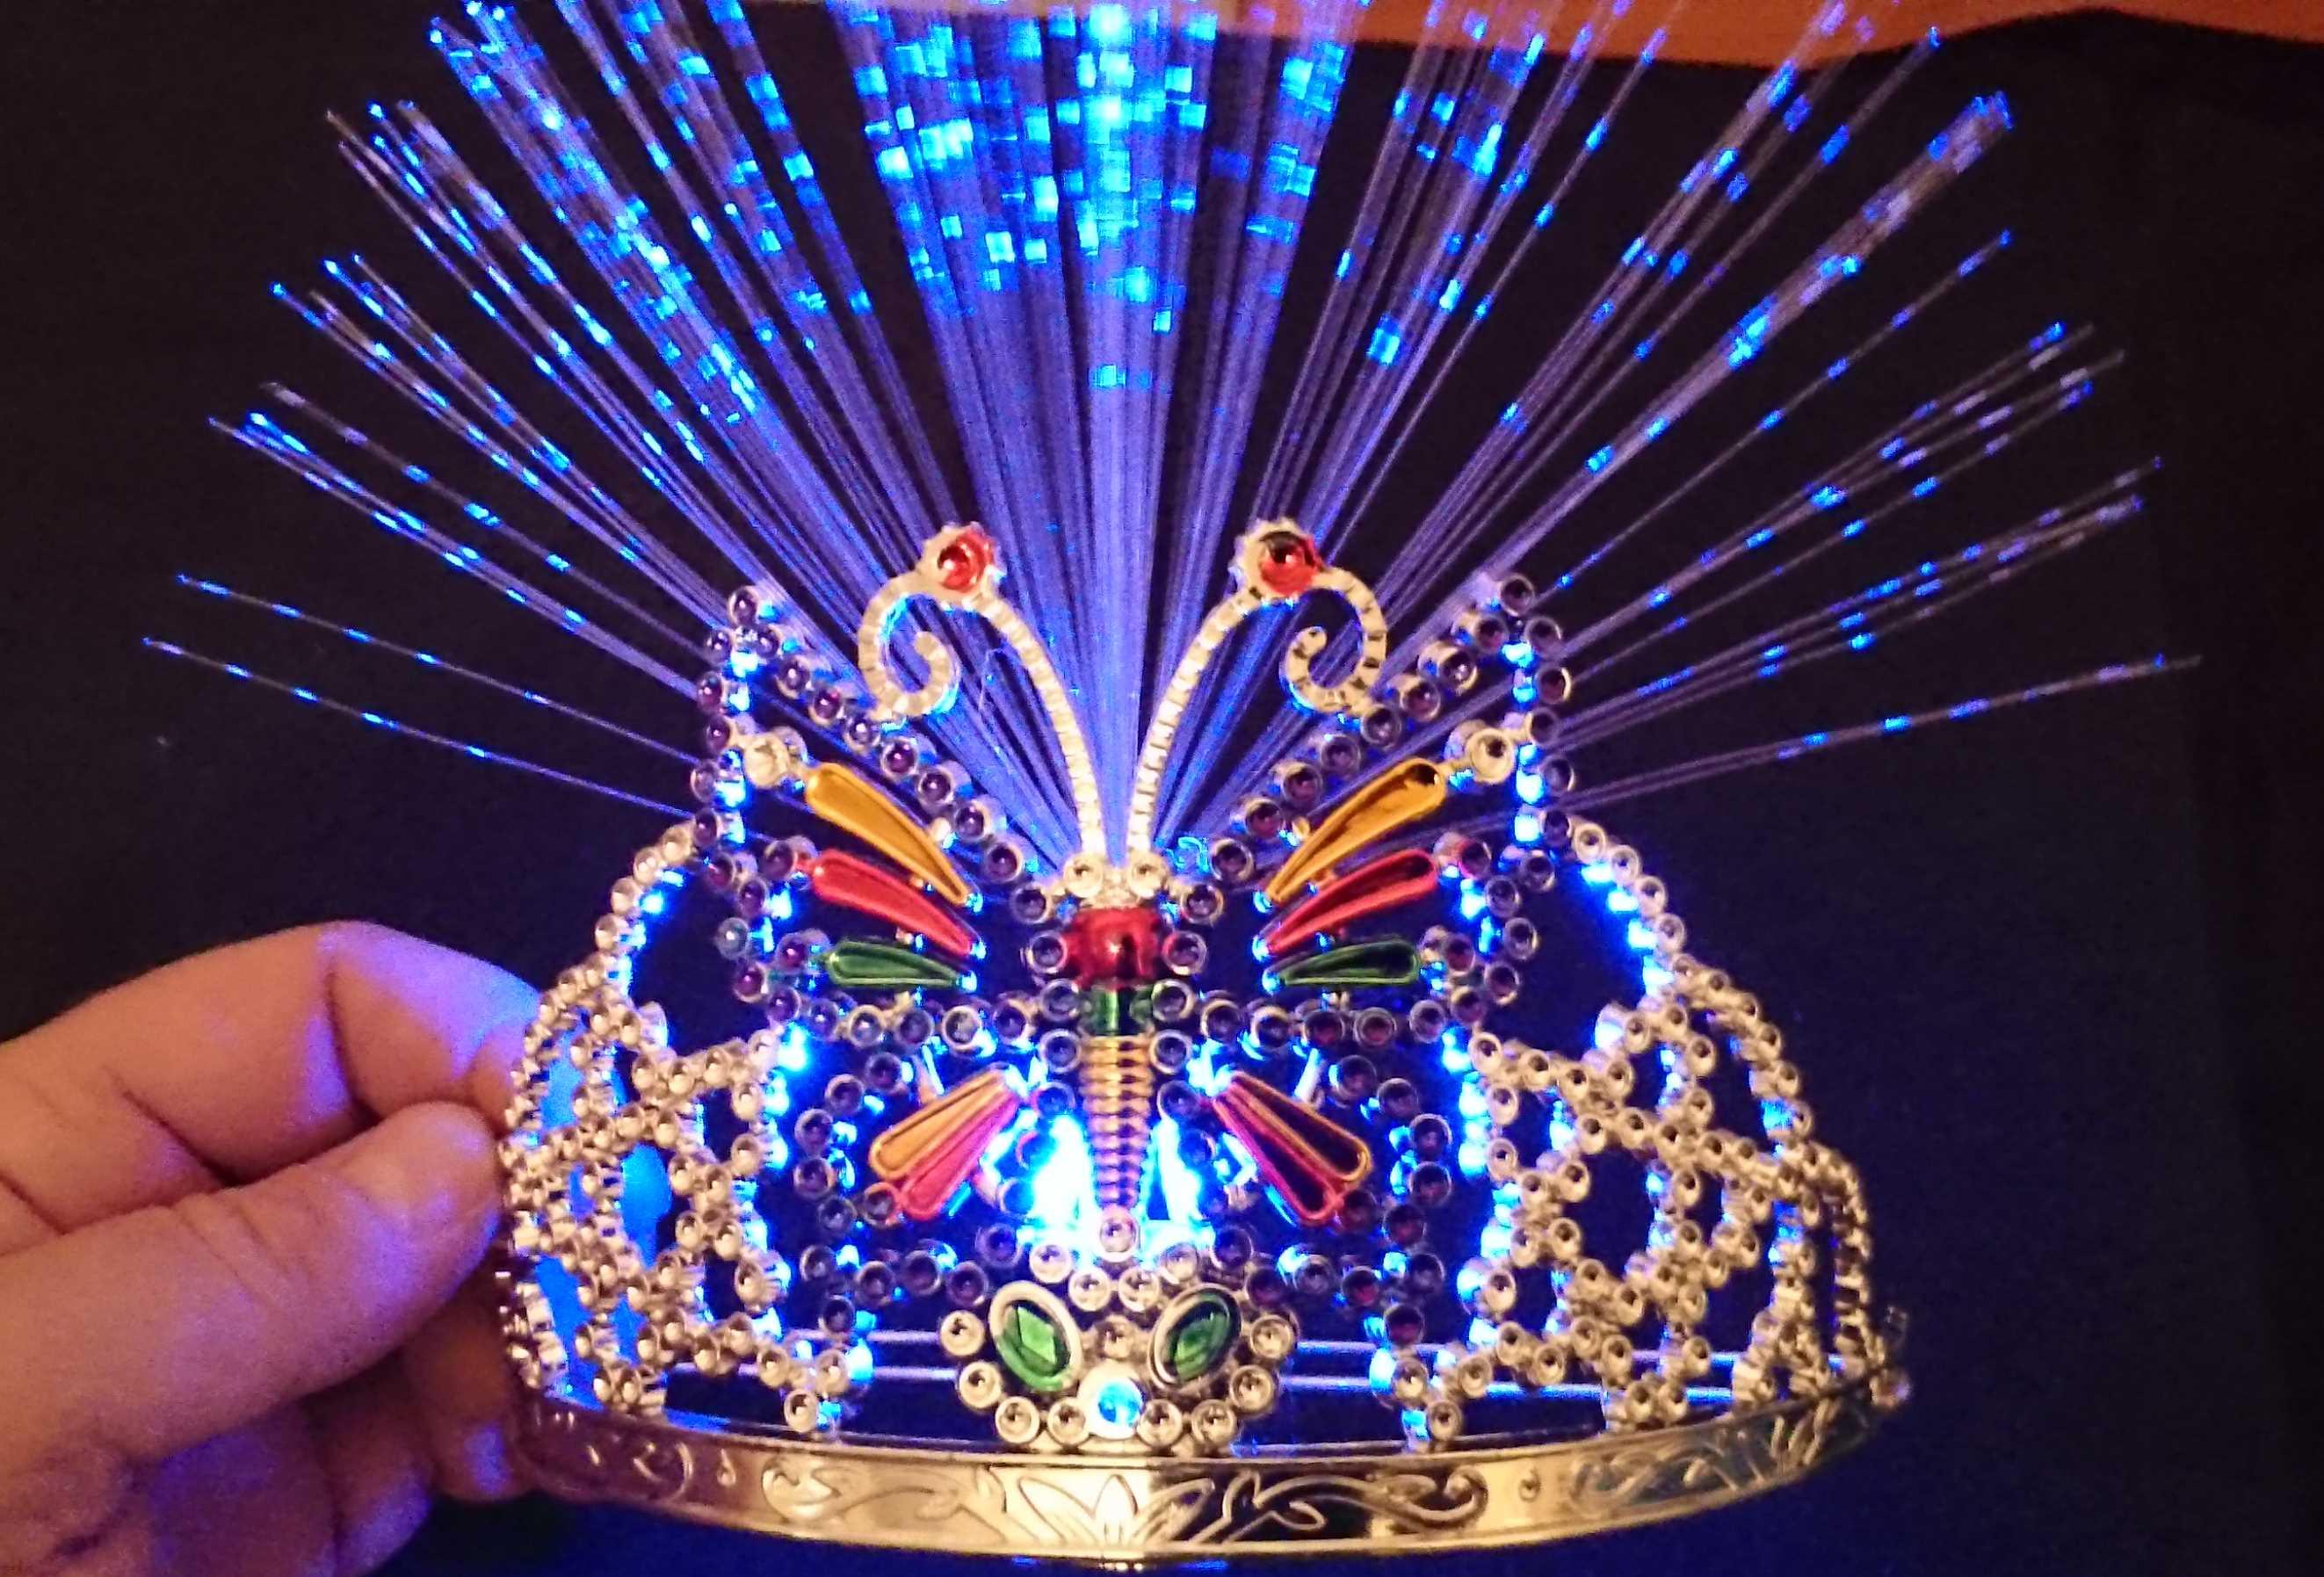 Leds Blink De Led Krone Diadem Schmetterling Prinzessin